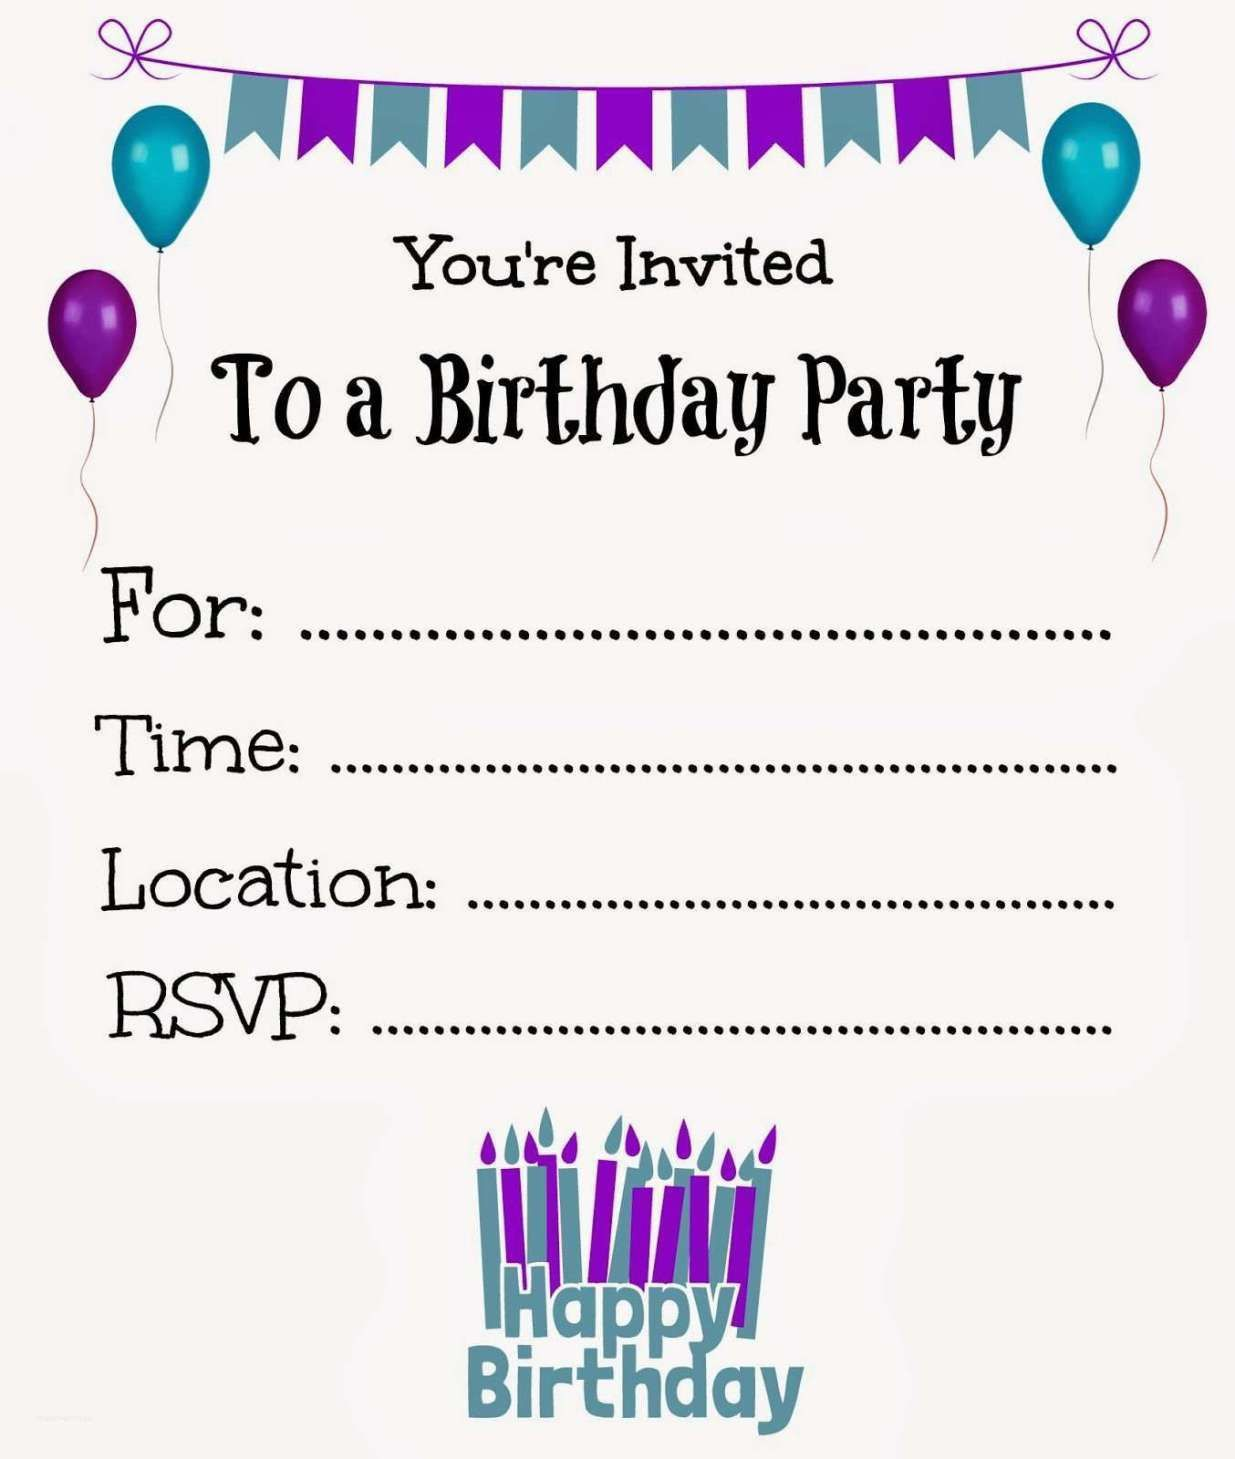 005 Fearsome Free Birthday Card Invitation Template Printable Idea Full